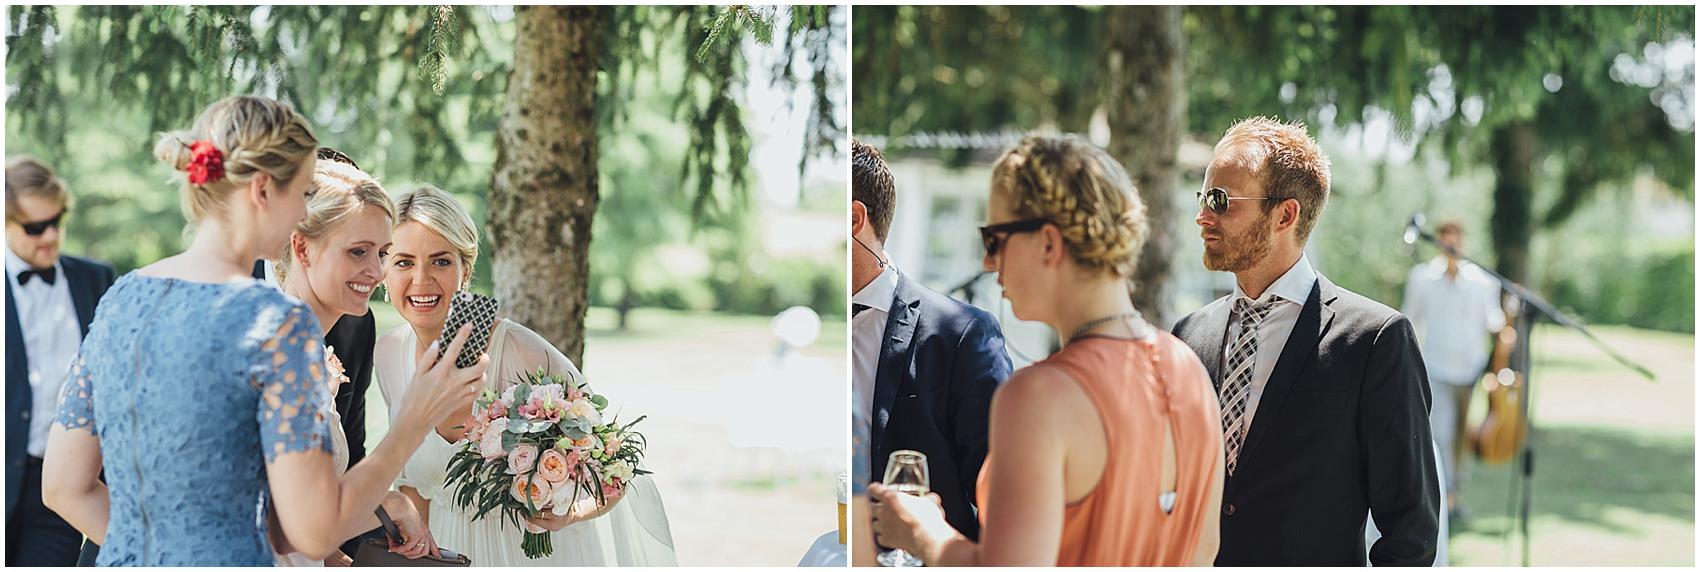 destination-wedding-phtotographer-italy-lake-garda_0528